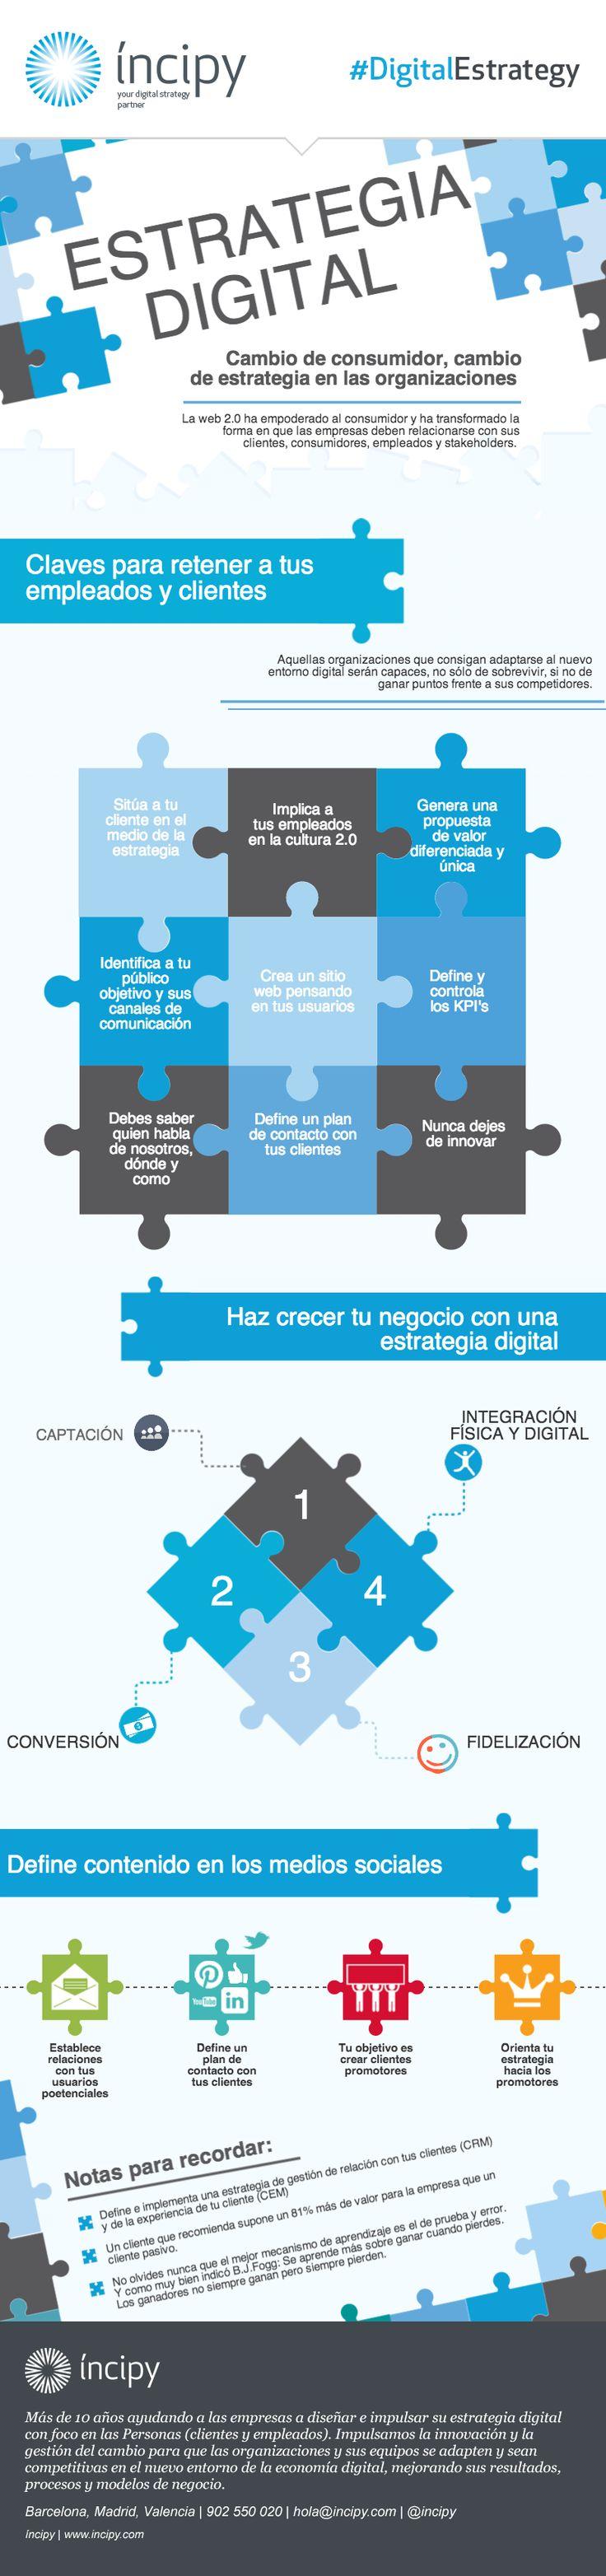 Claves para una estrategia digital de éxito #infografia